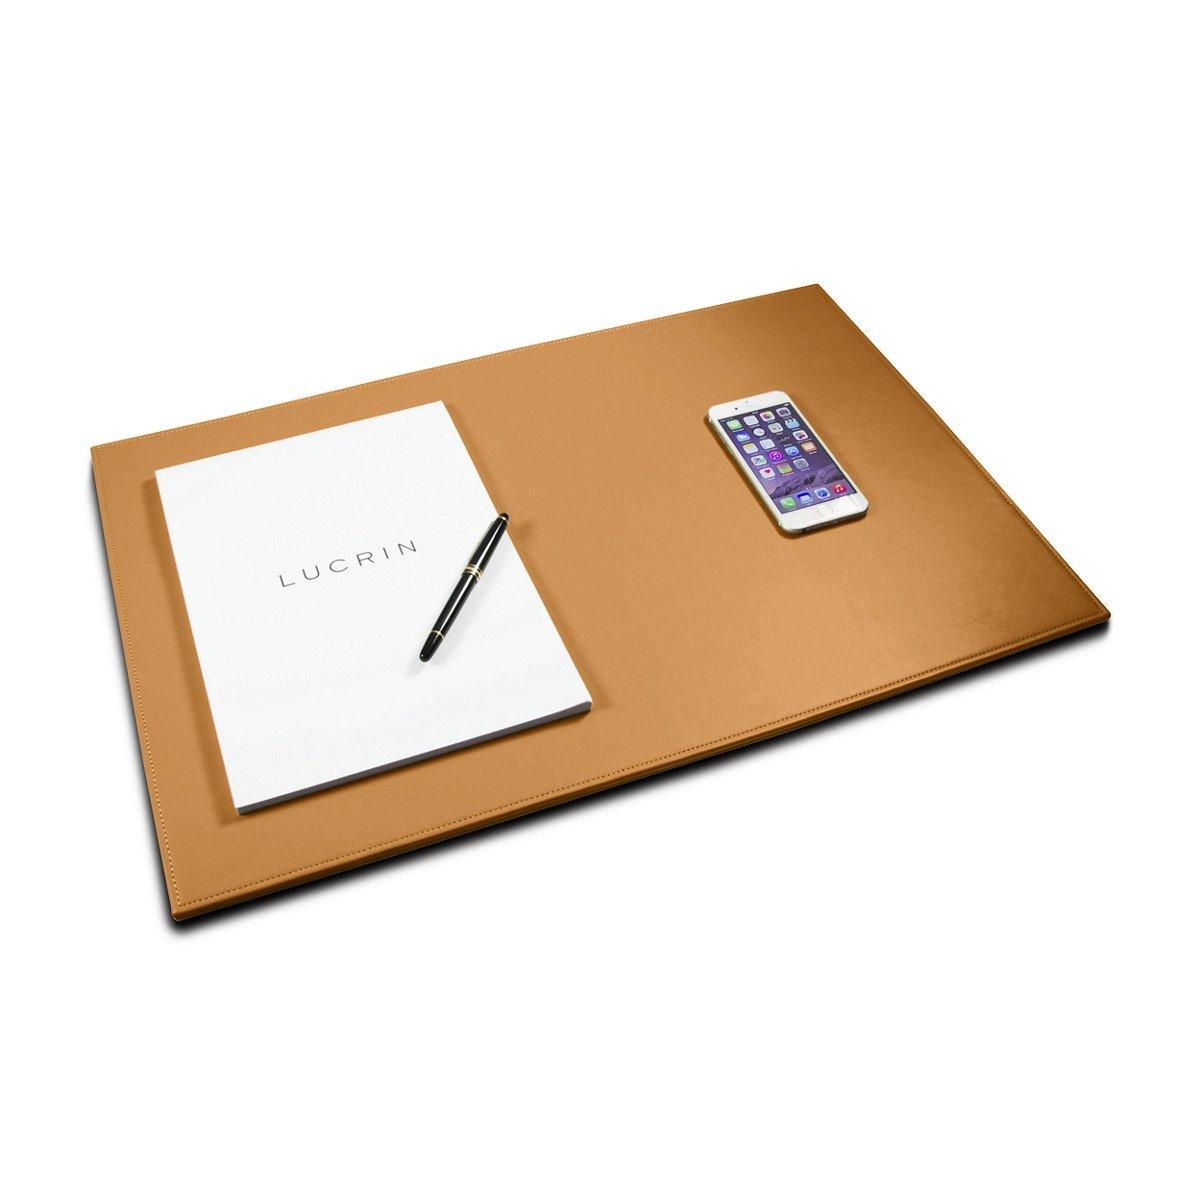 "Lucrin - Custom Desk pad blotter (23.6"" x 15.7"") - Natural - Genuine Leather"